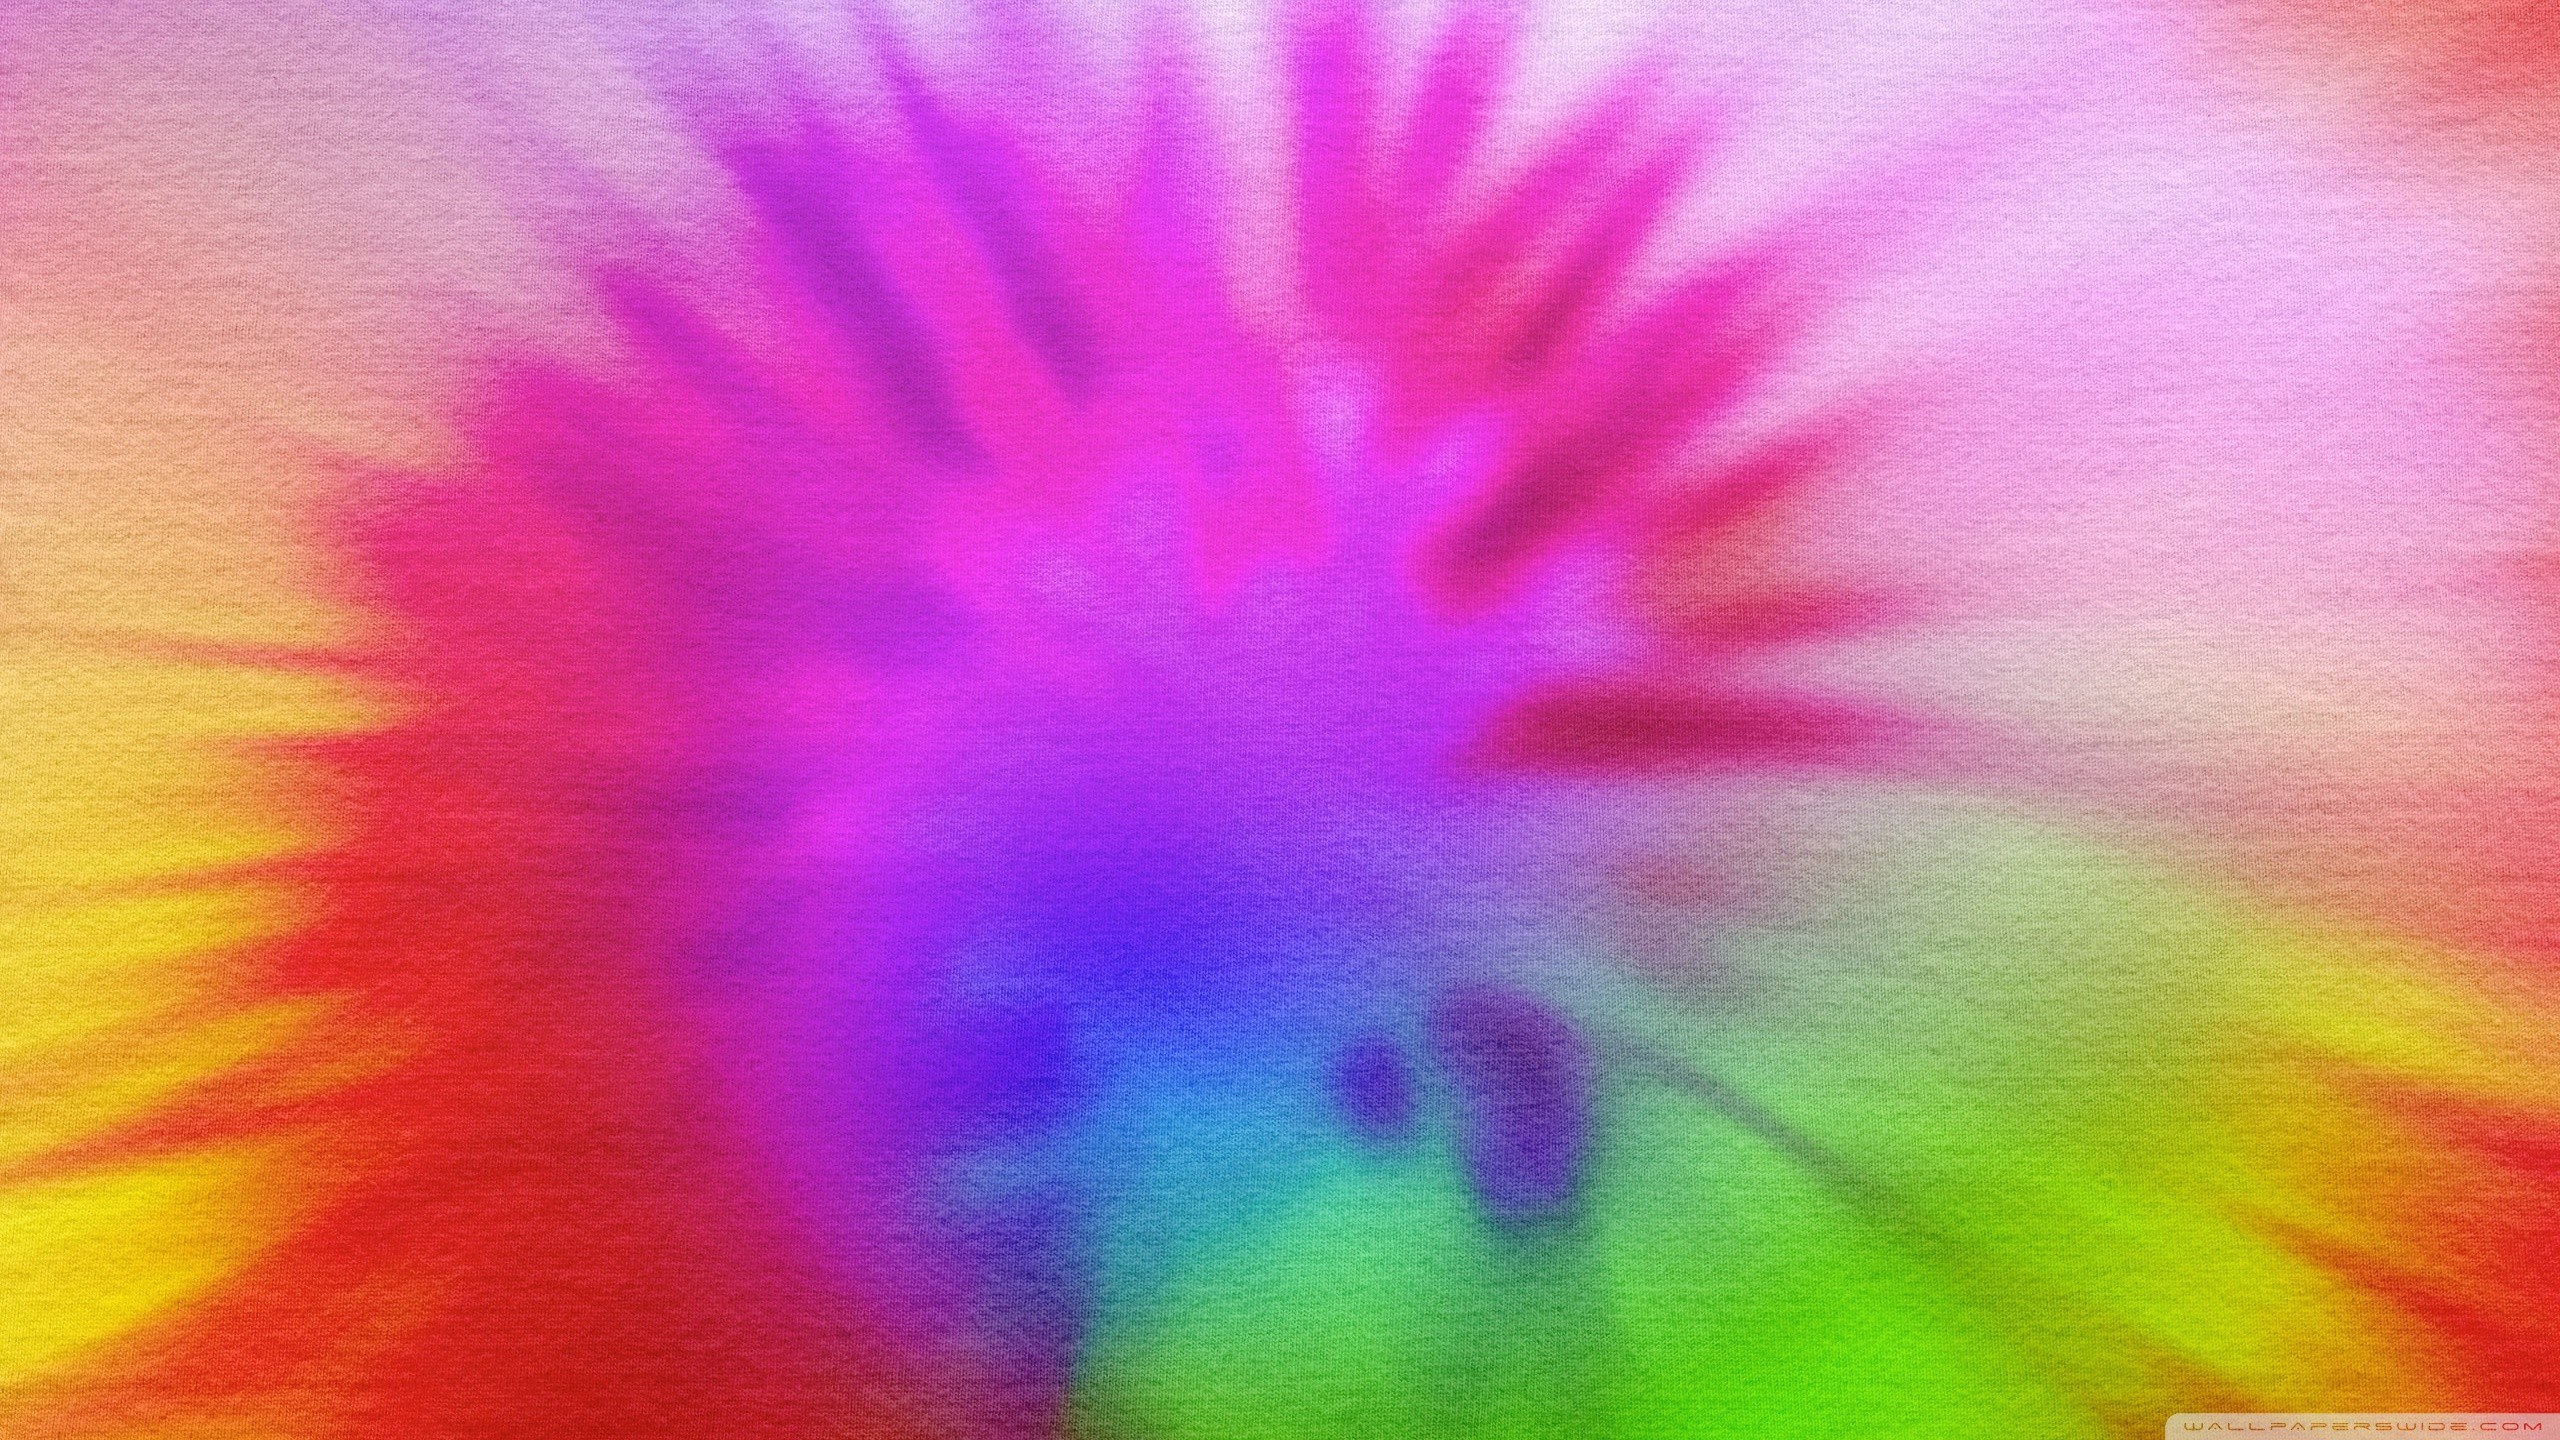 Wallpaper Tie Dye 50 images 2560x1440